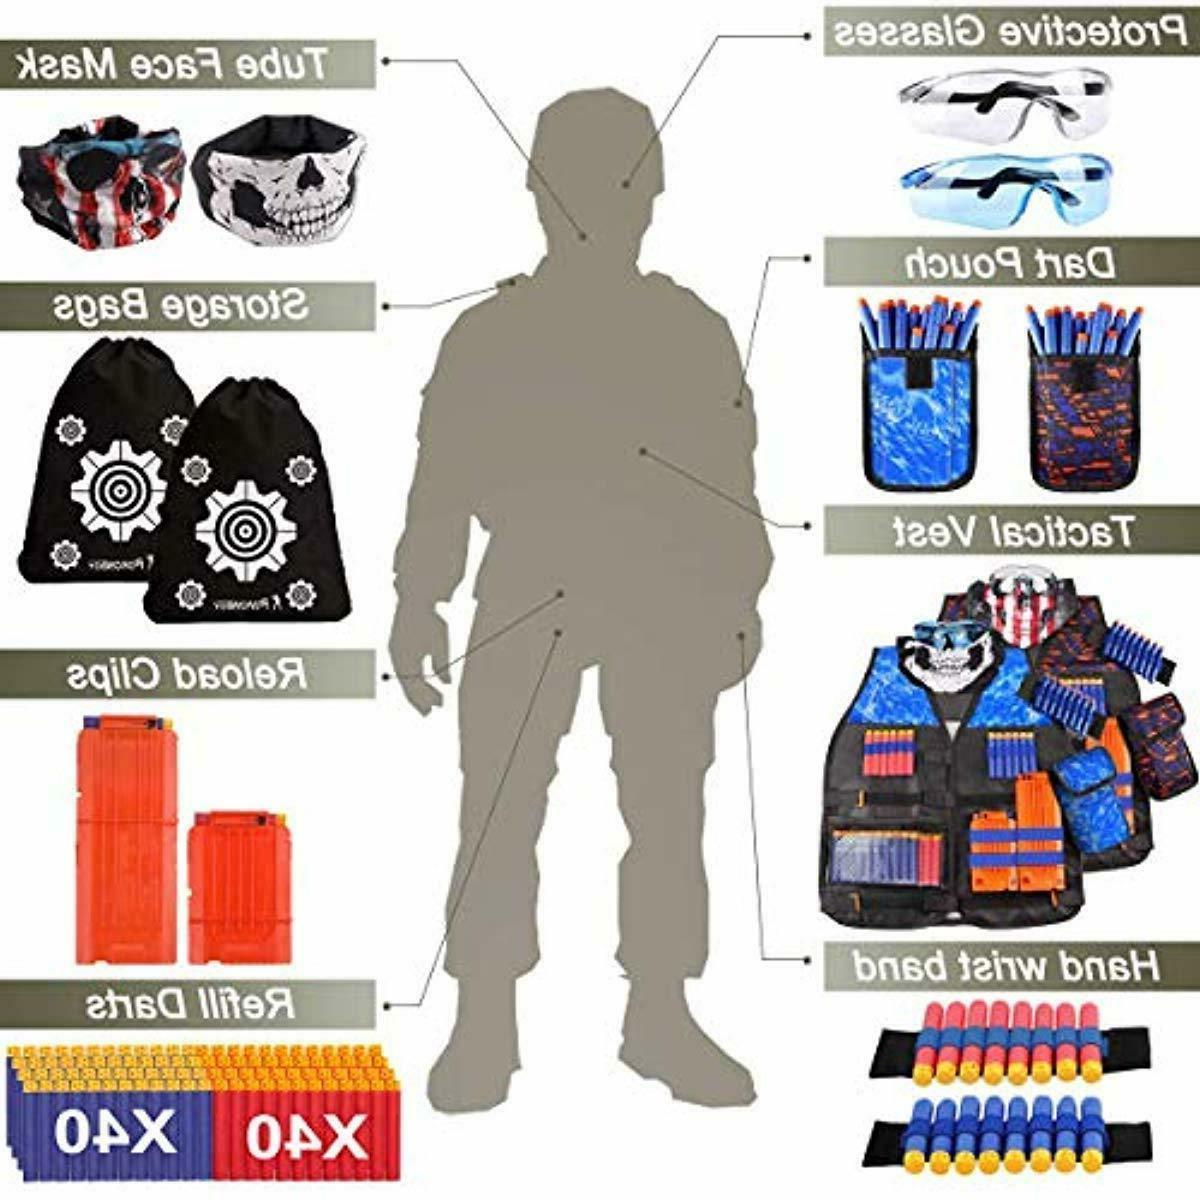 POKONBOY 2 Tactical Vest Kits Nerf Guns N-Strike Seri